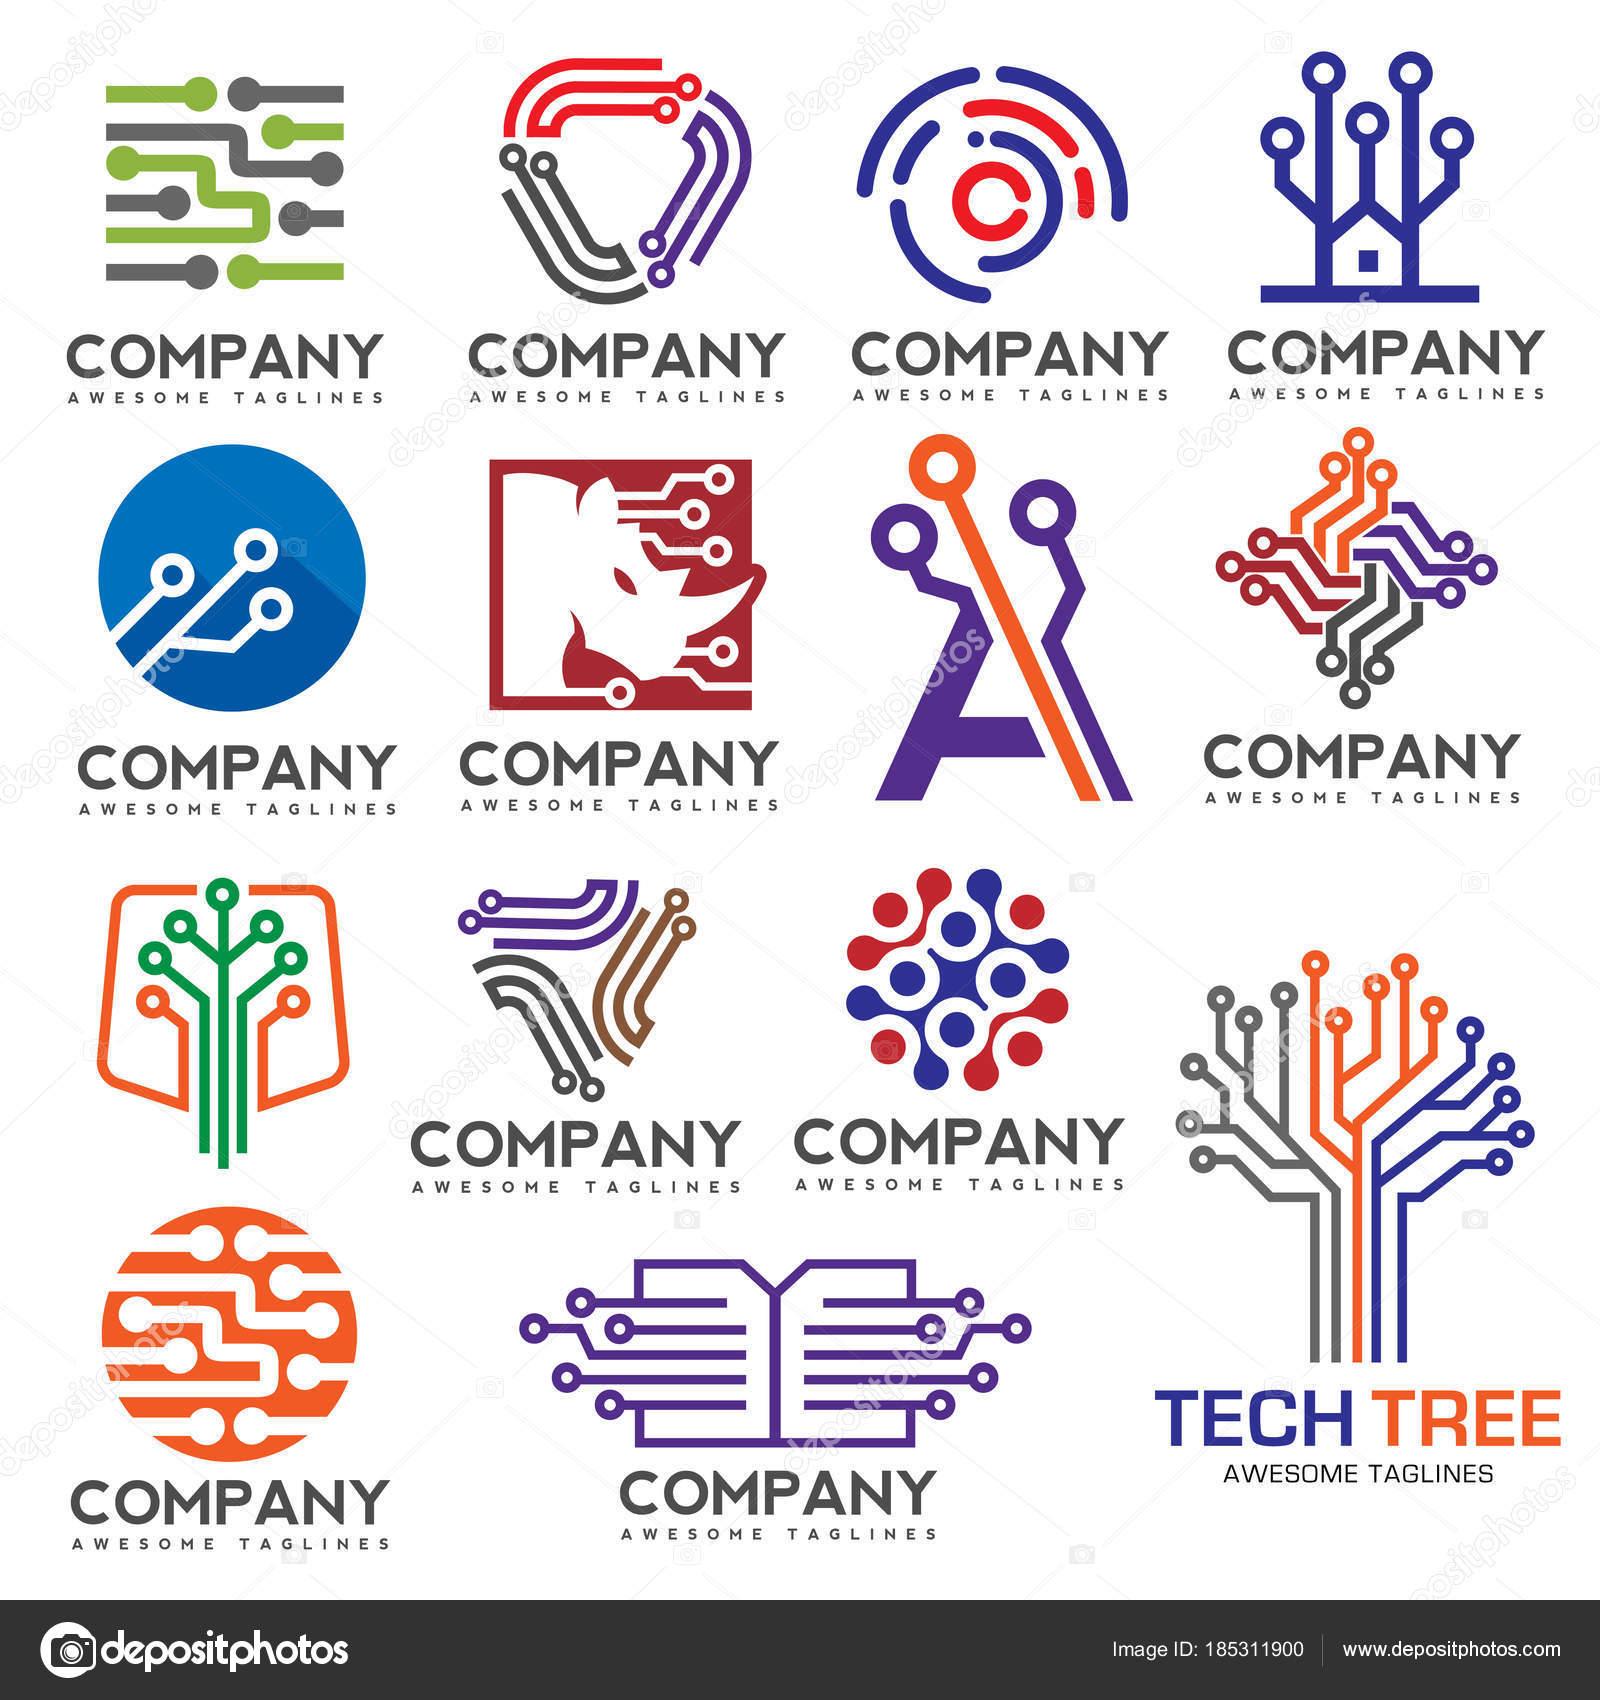 Electronics Circuit Design Companies Modern Of Wiring Diagram Simple Software Digital Set Logo Creative Electronic Circuits Rh Depositphotos Com